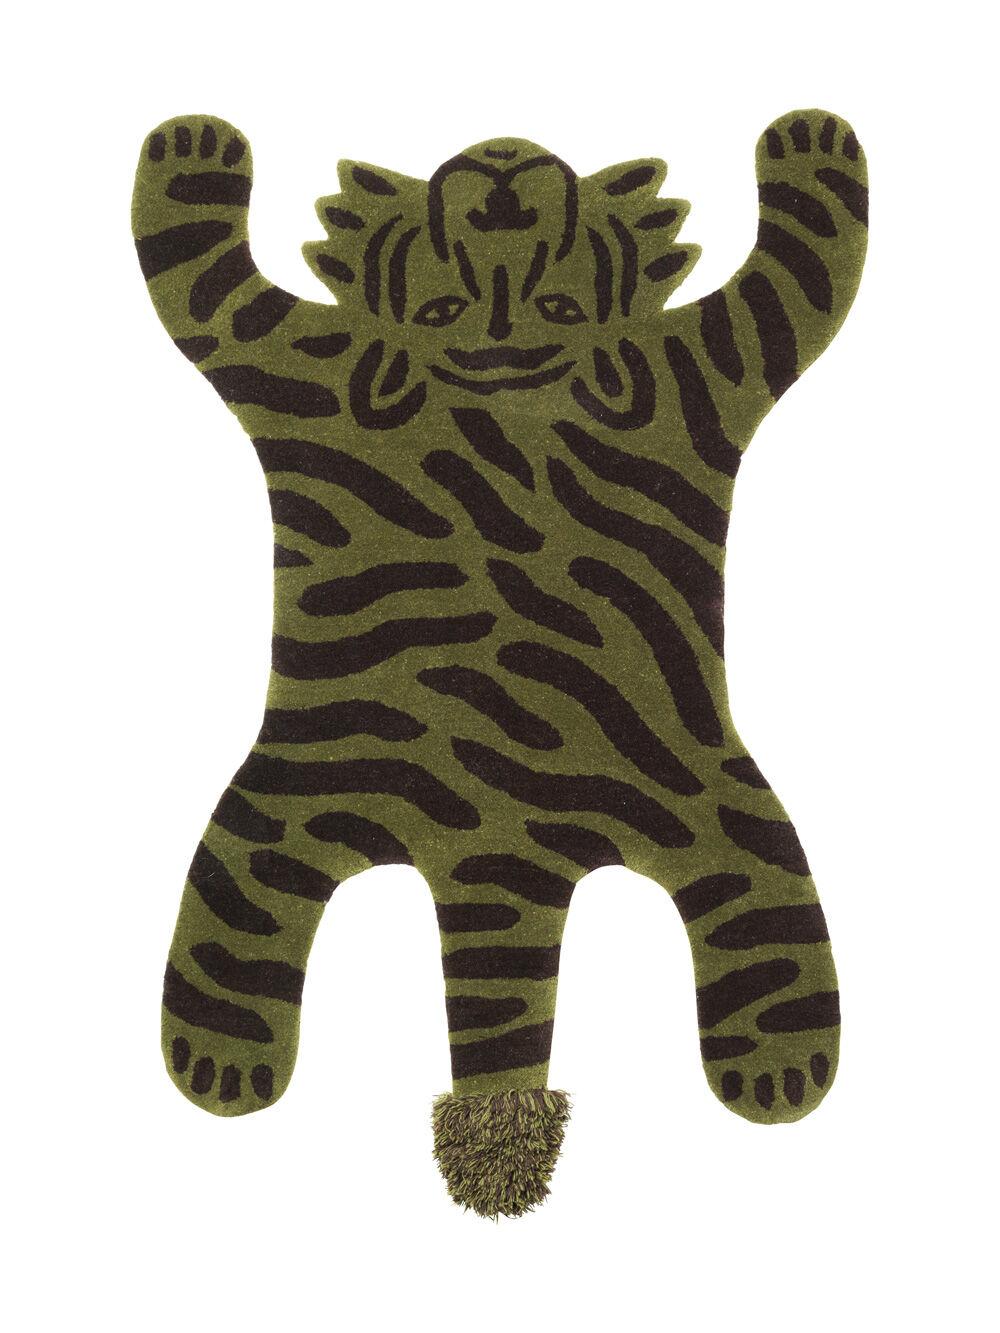 Ferm Living KIDS Safari Tufted Rug, Tiger